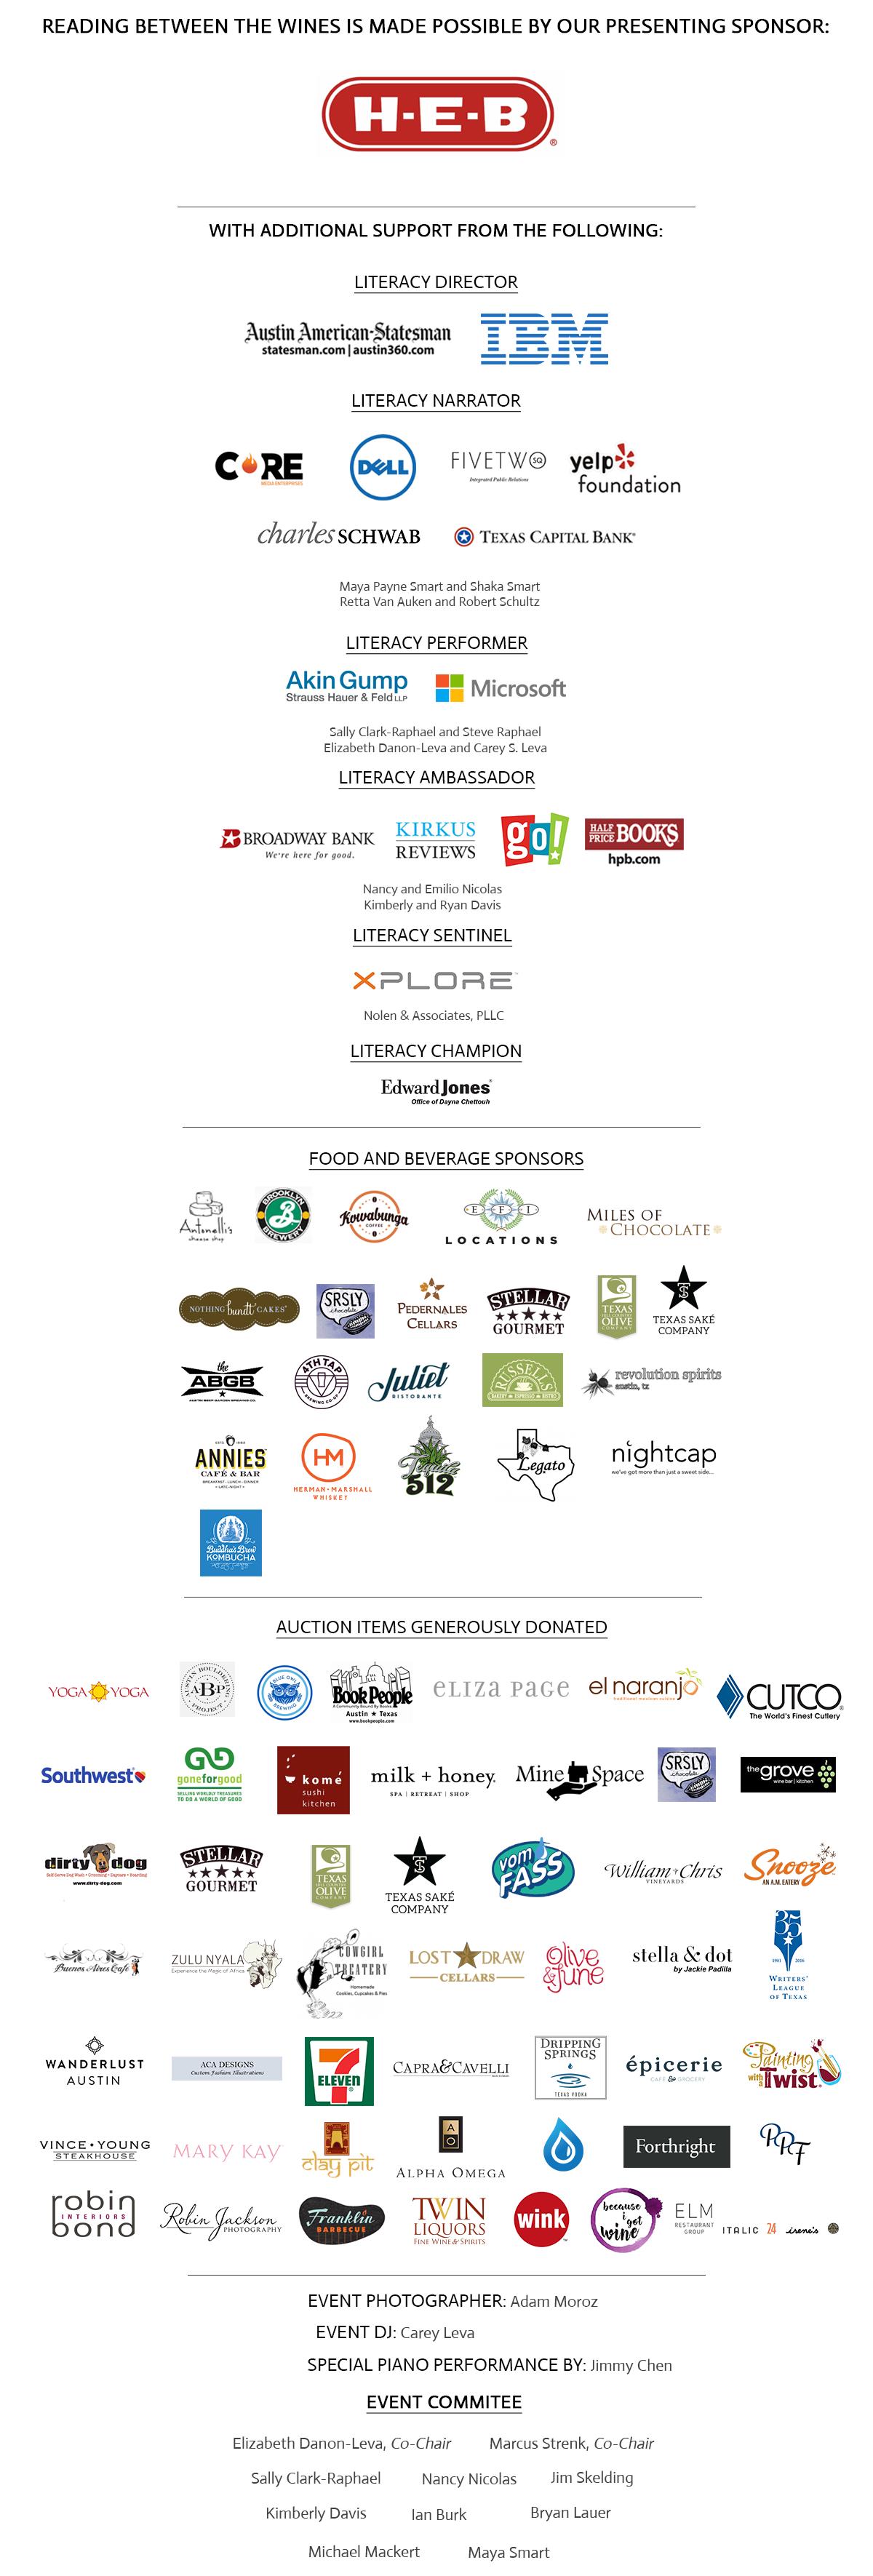 RBTW_sponsors.png